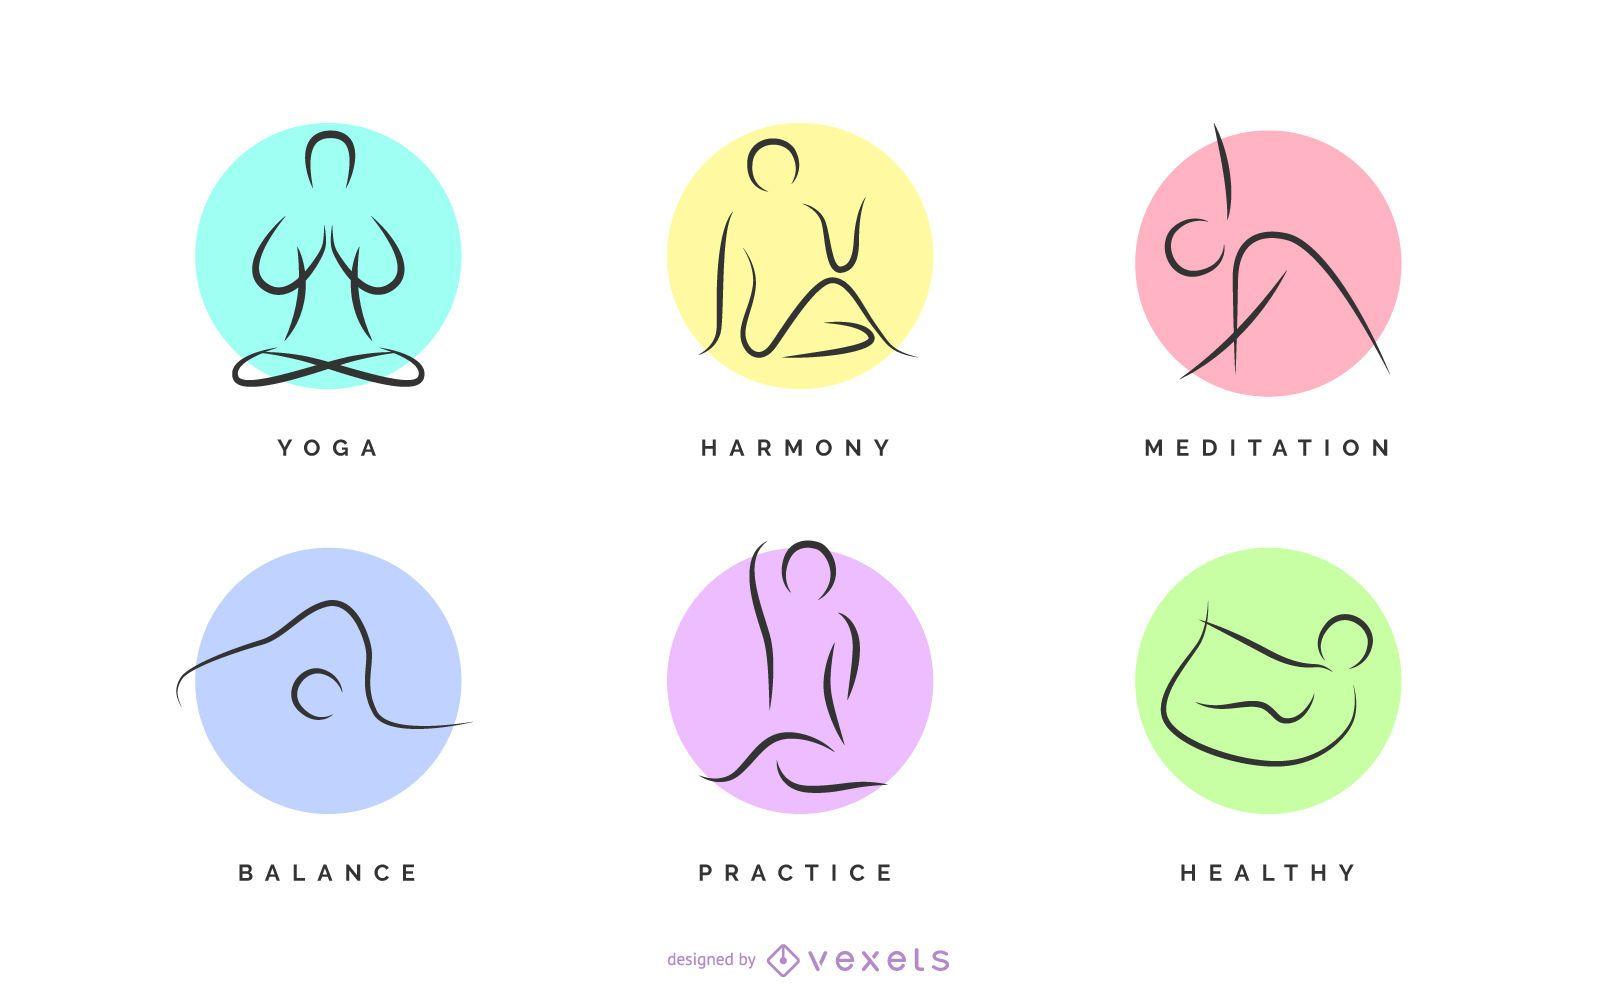 Yoga poses logo set